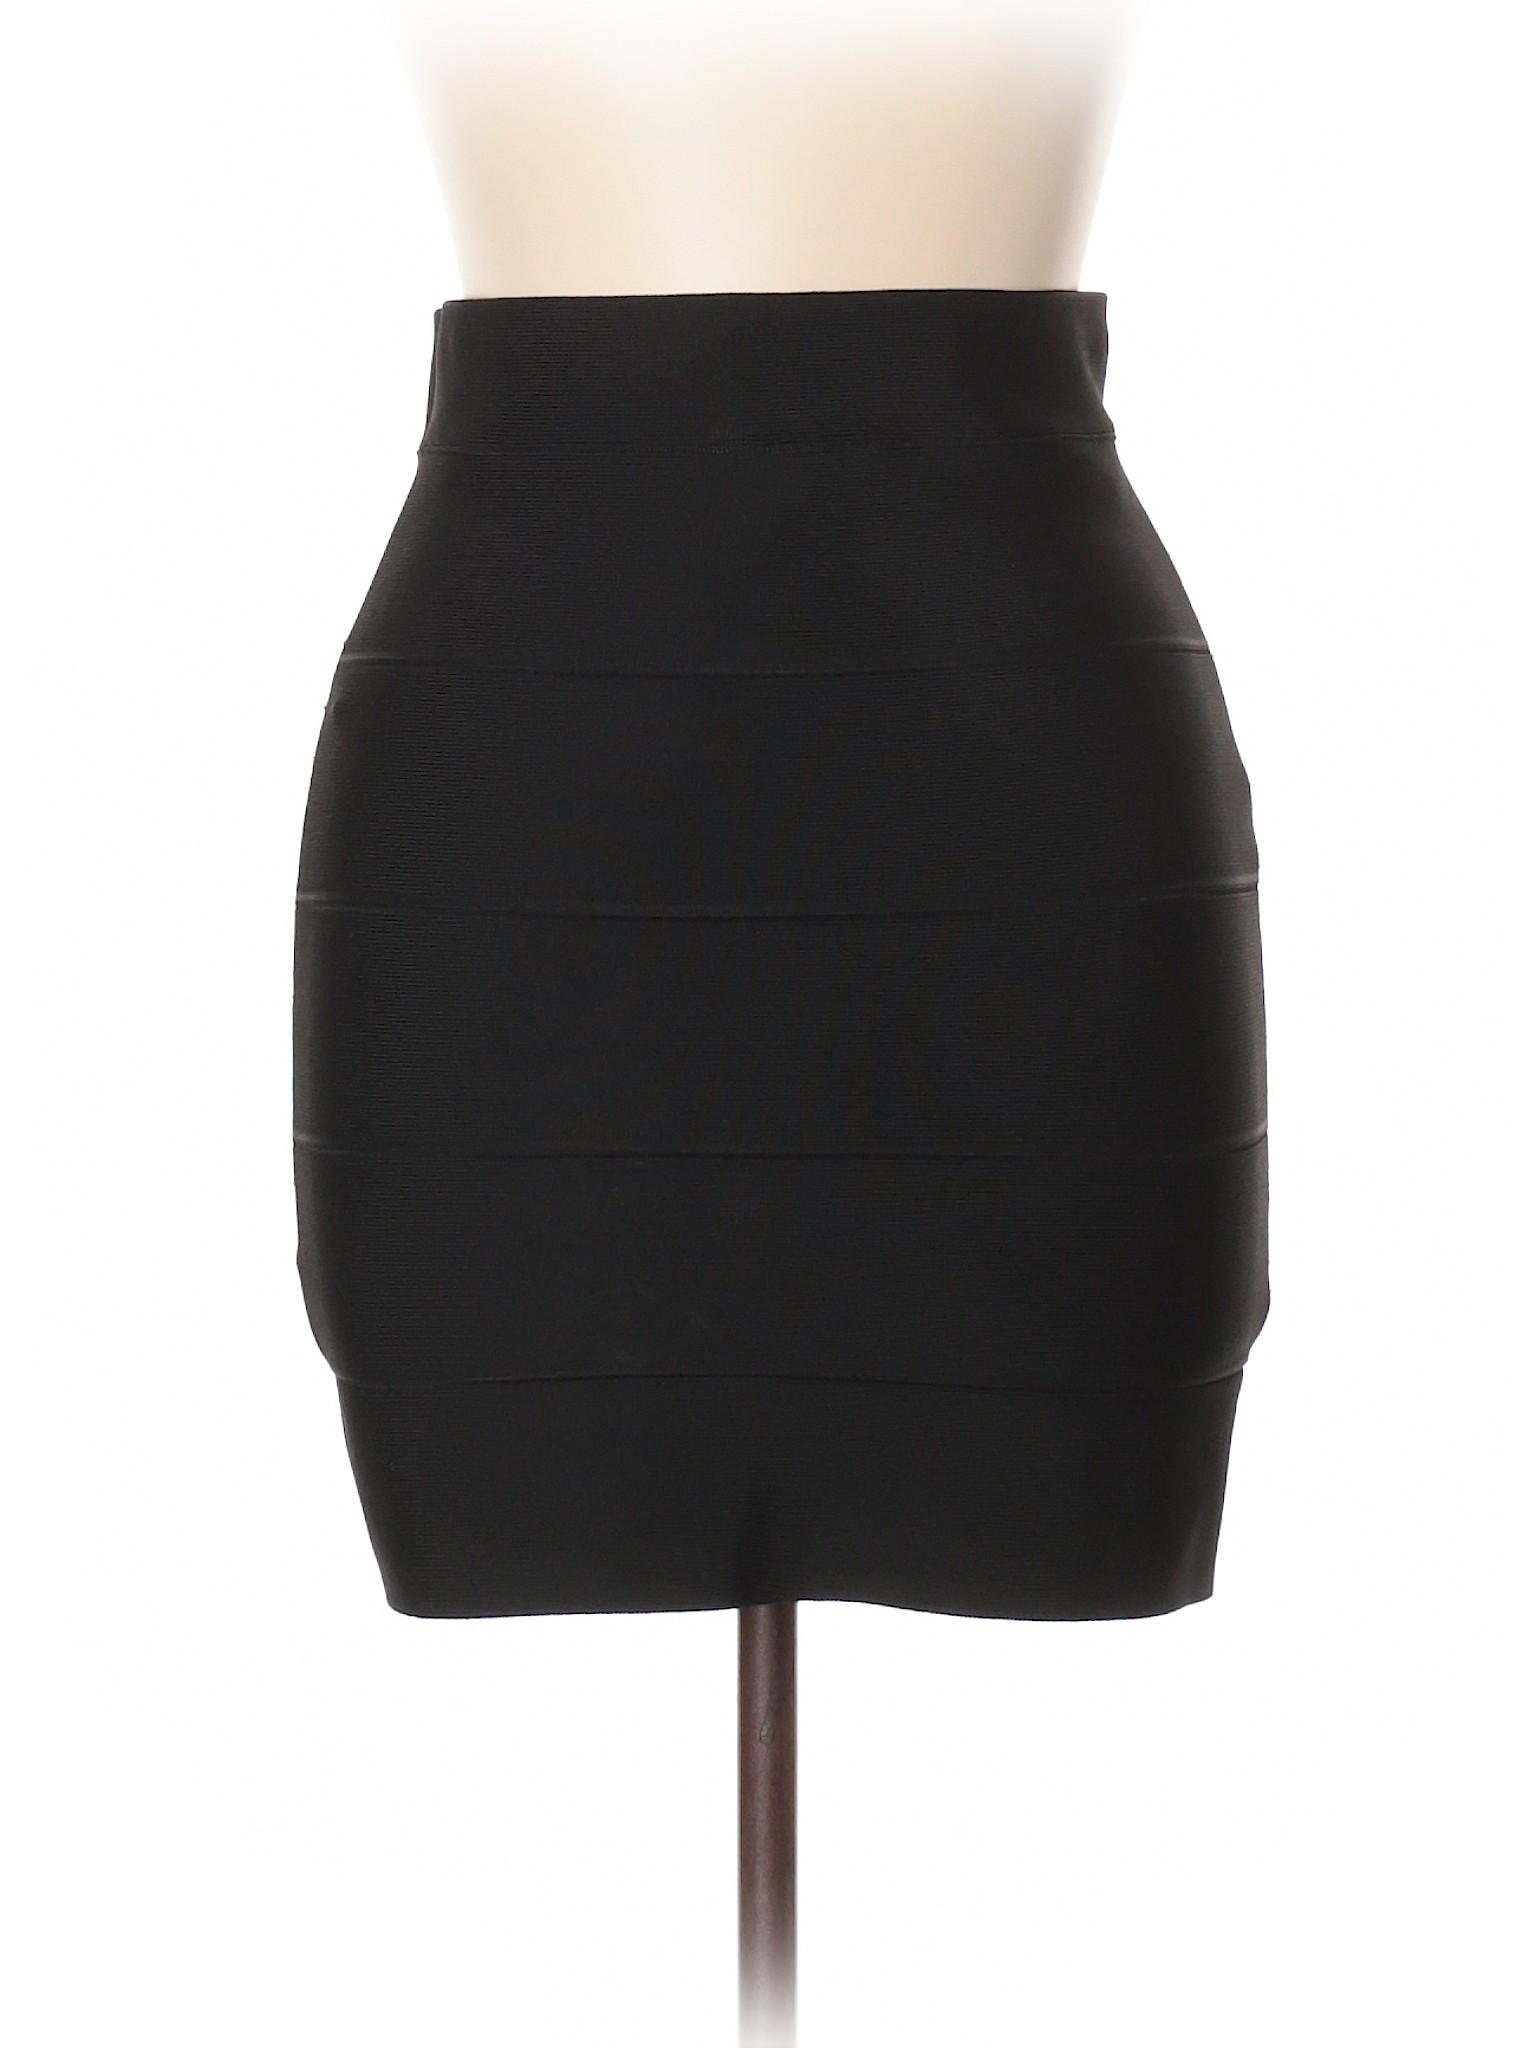 Boutique Boutique BCBGMAXAZRIA Boutique Casual Skirt Casual leisure Skirt leisure leisure BCBGMAXAZRIA Casual BCBGMAXAZRIA HqUFw6A